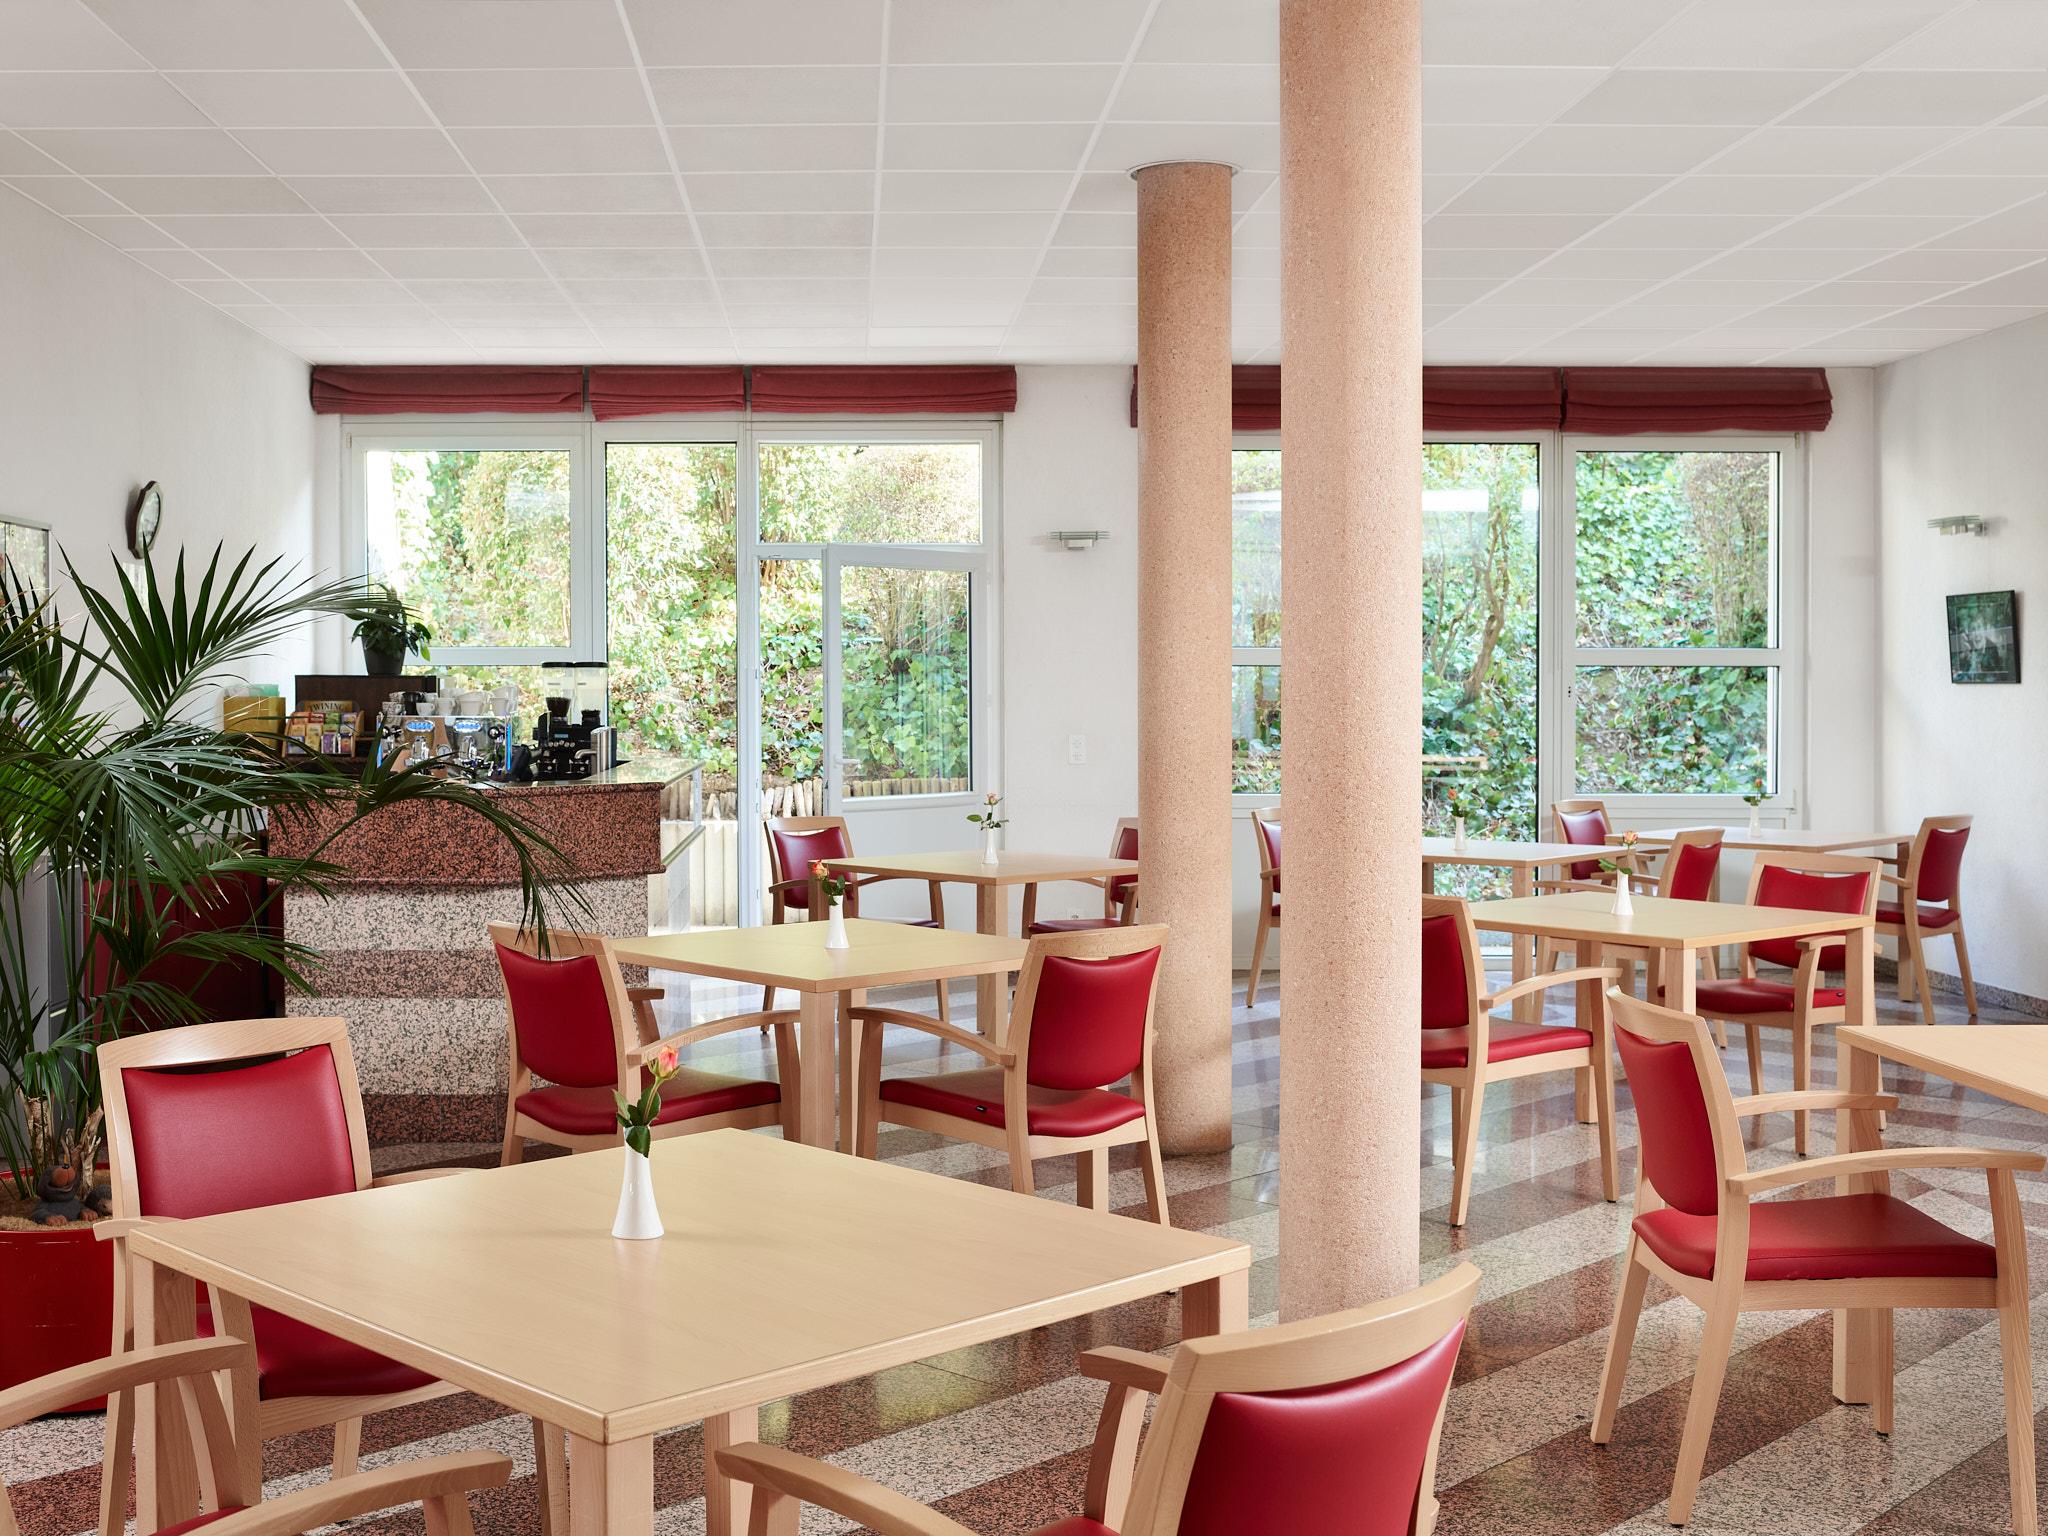 EMS Meyrin - Résidence Jura - Cafétéria